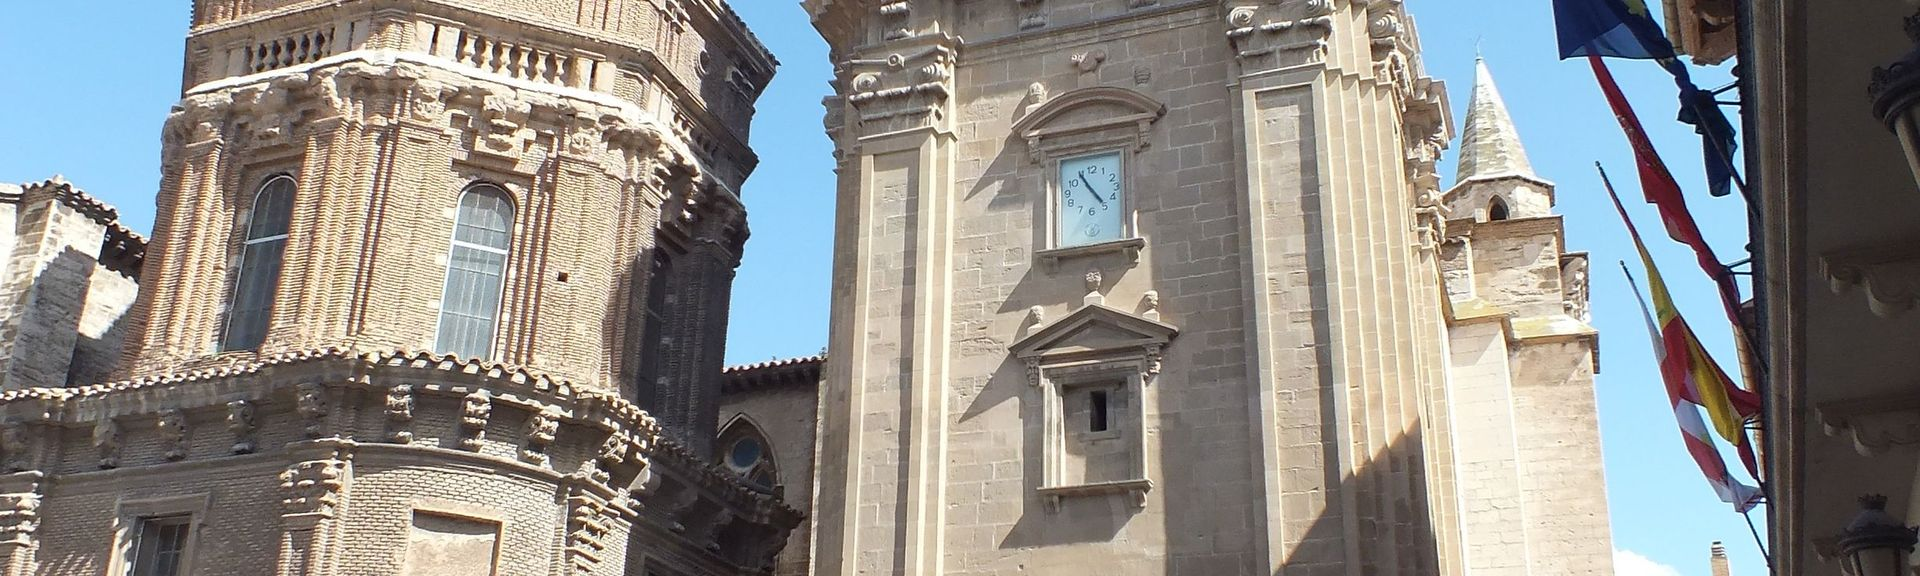 Cortés, Navarre, Spanje